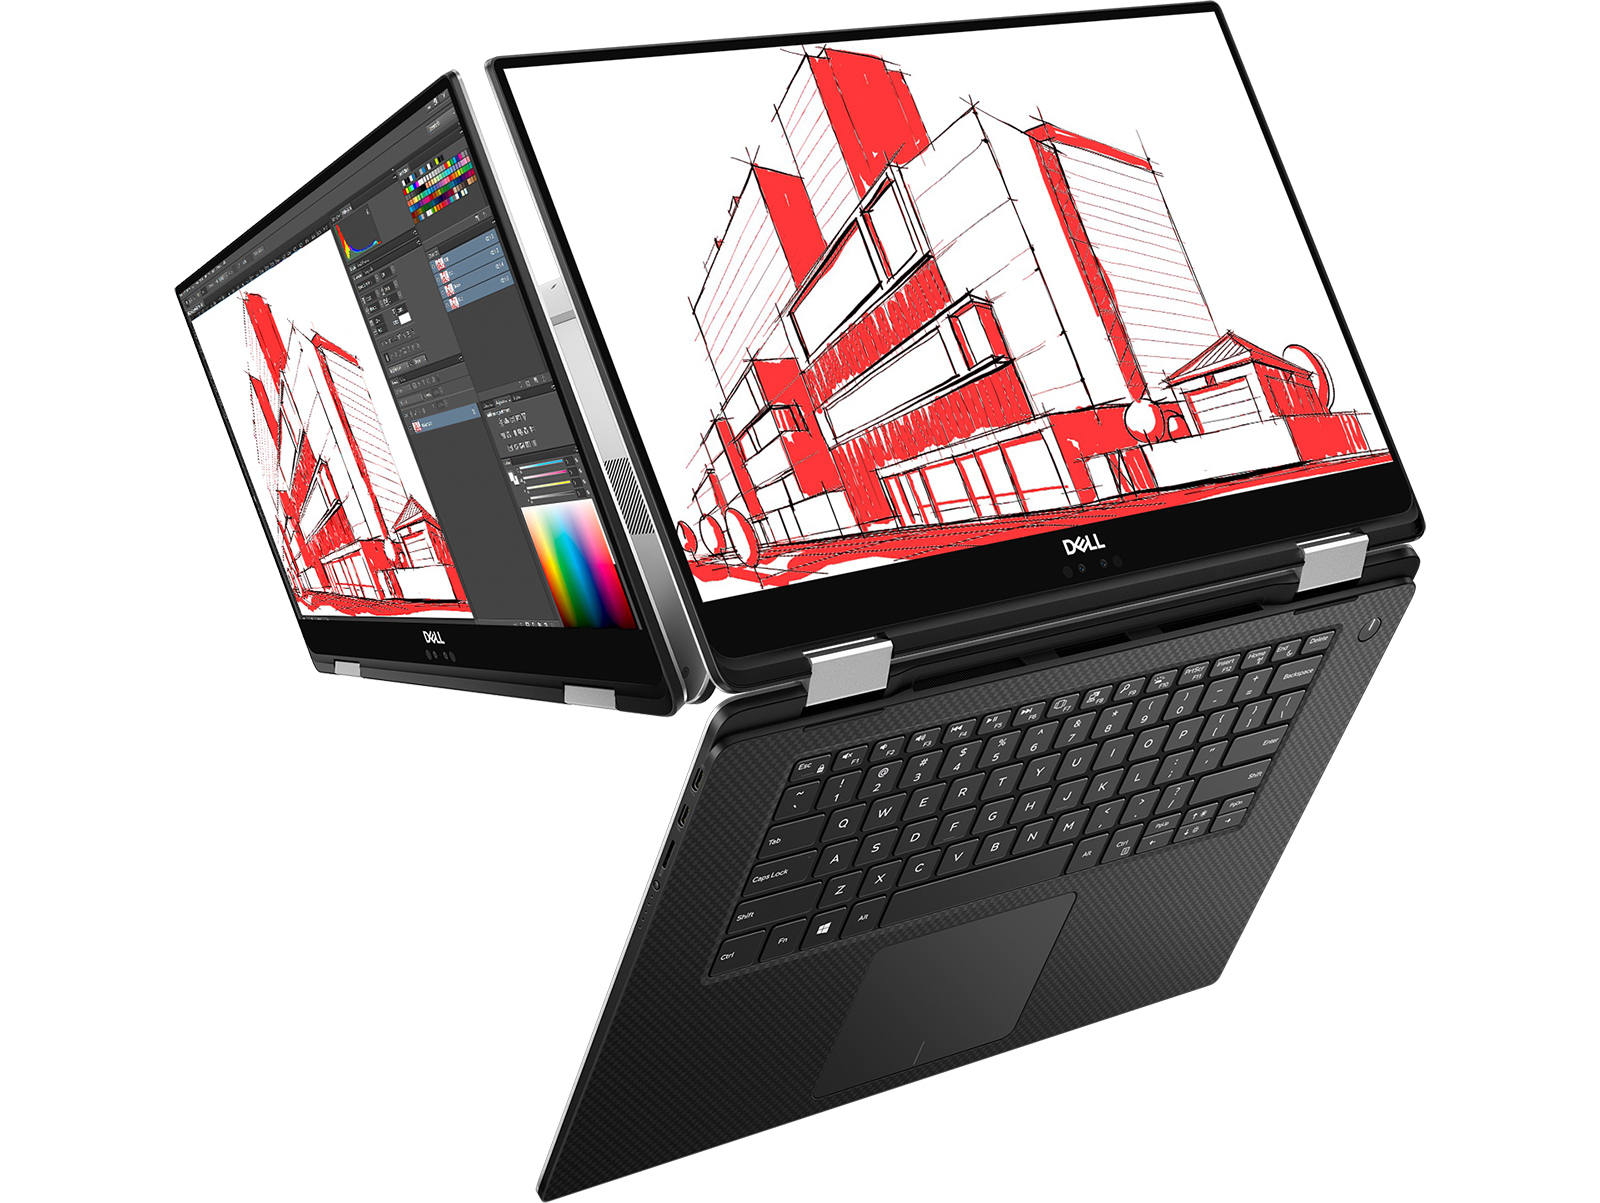 Dell Unveils Precision 2-in-1 5530 Workstation: 15 6-inch